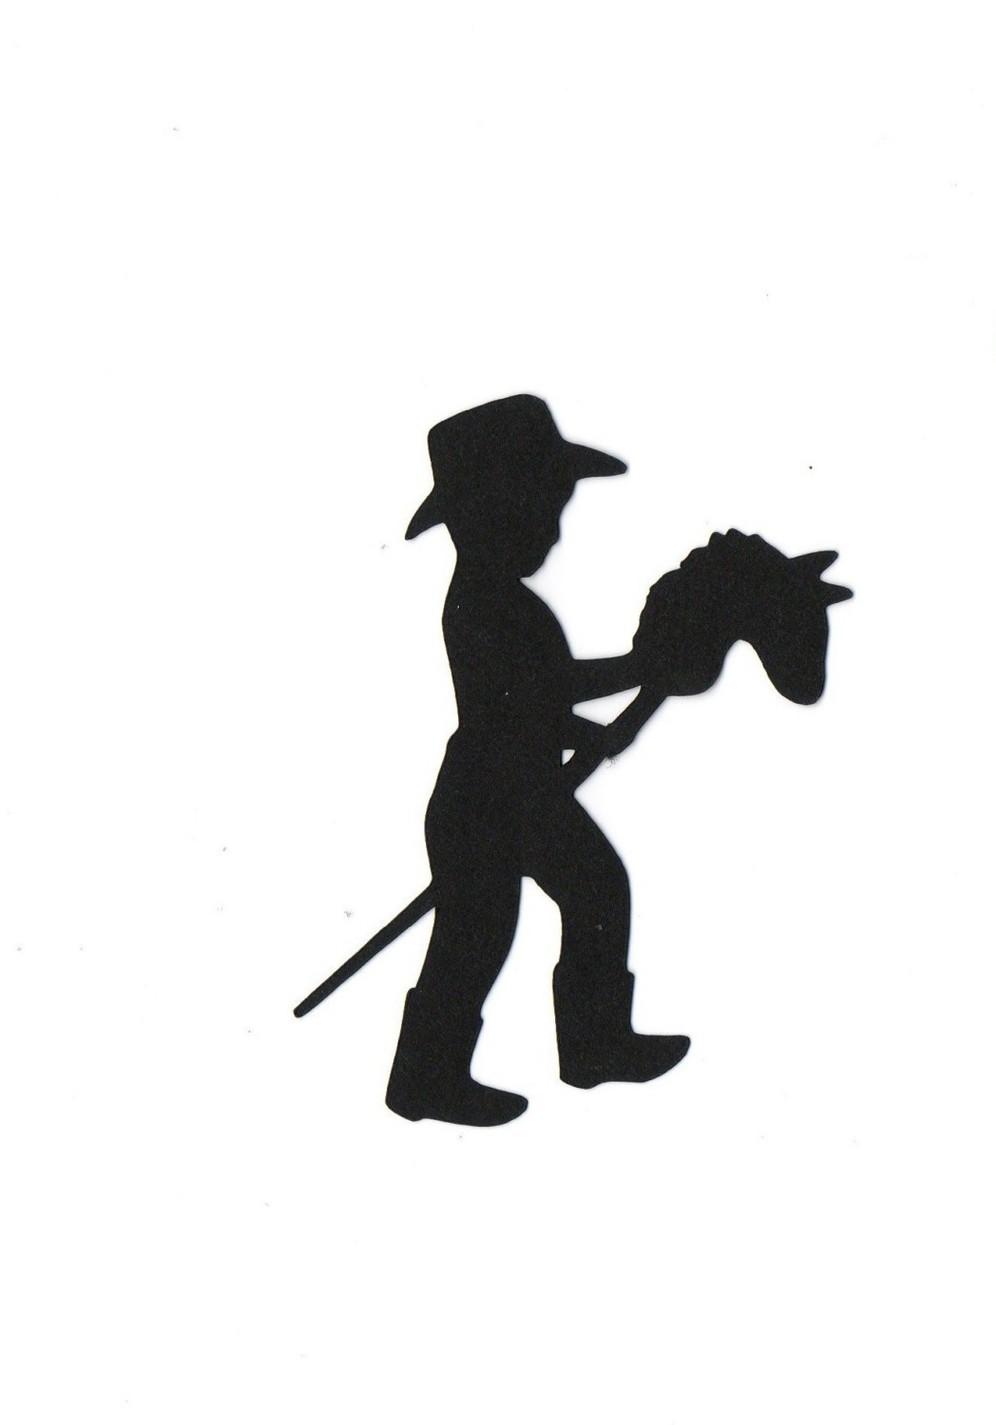 996x1425 Of Cowboy Silhouette Soldering Gun